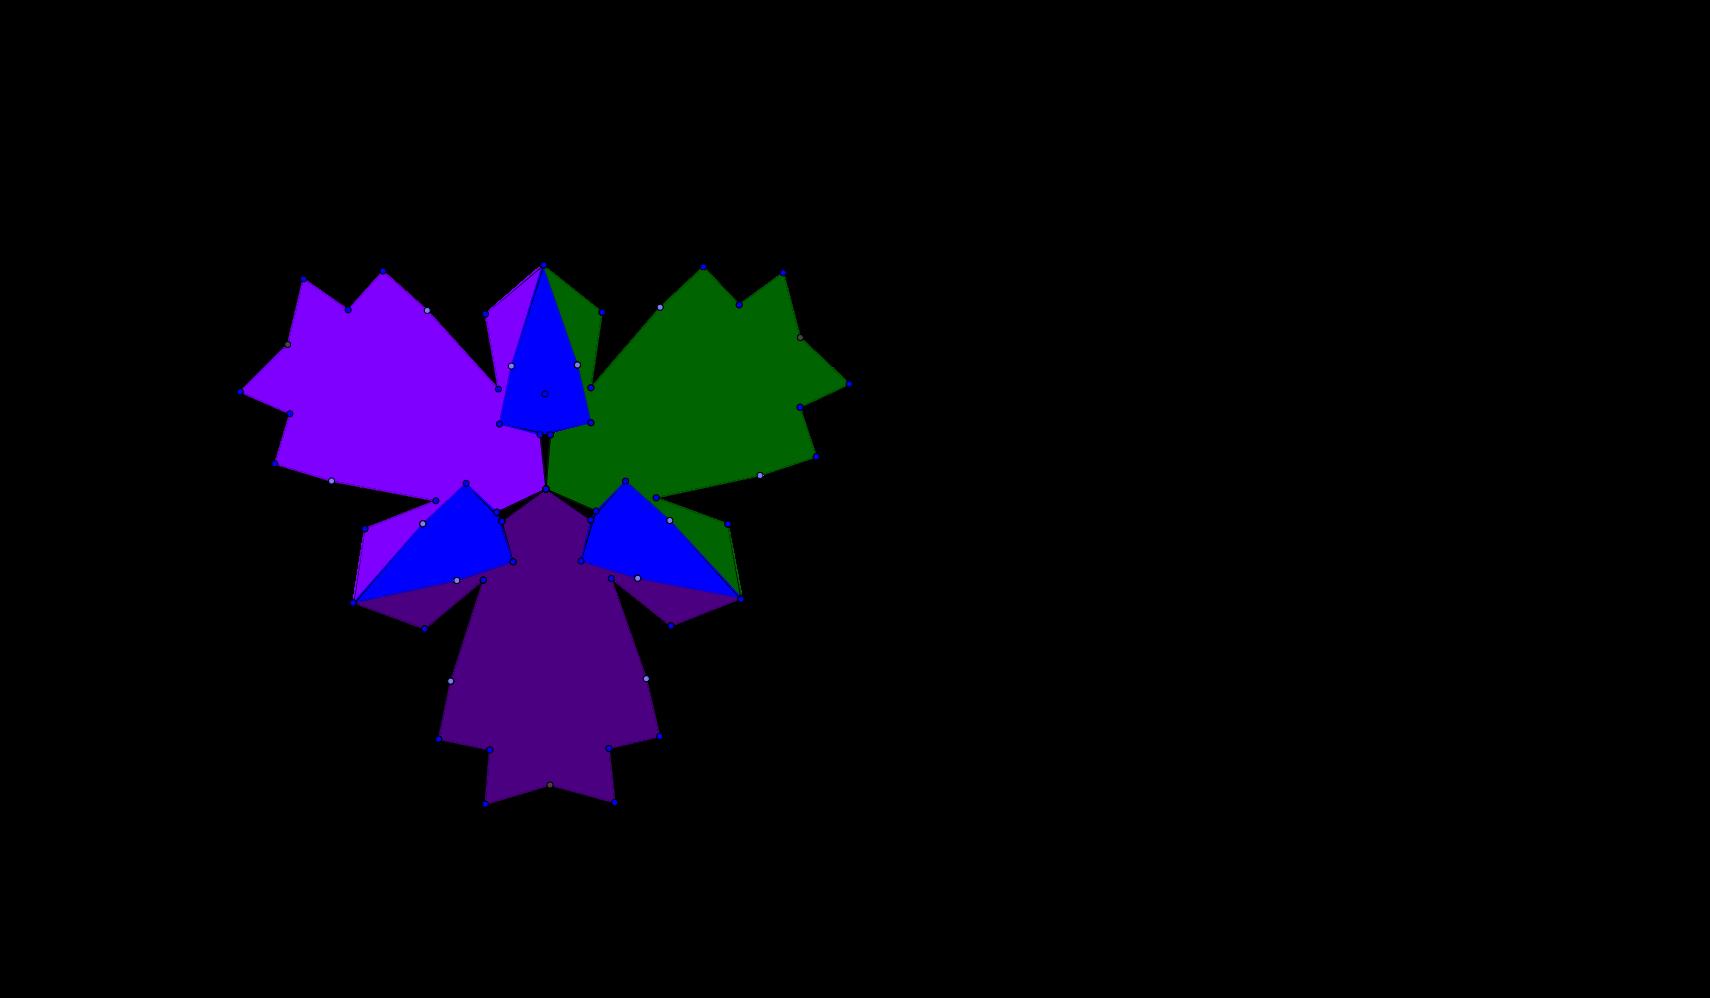 Intro Reflection Tessellation 7